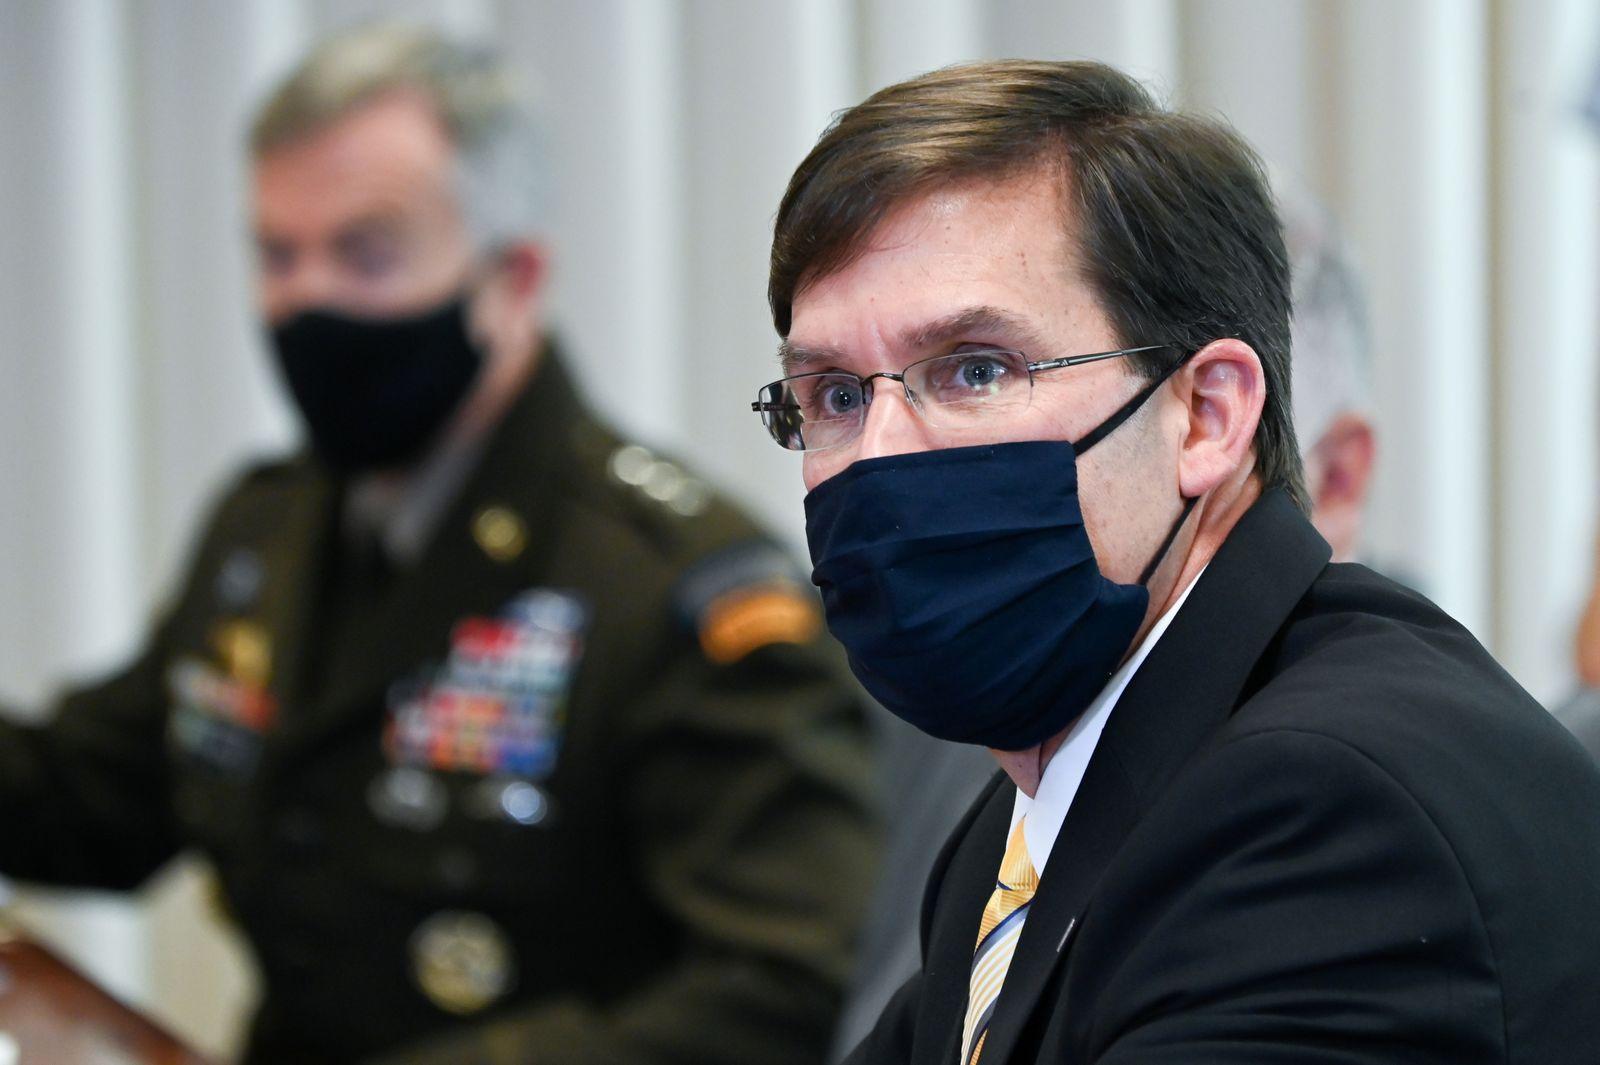 FILE PHOTO: U.S. Defense Secretary Esper participates in a meeting at the Pentagon in Arlington, Virginia